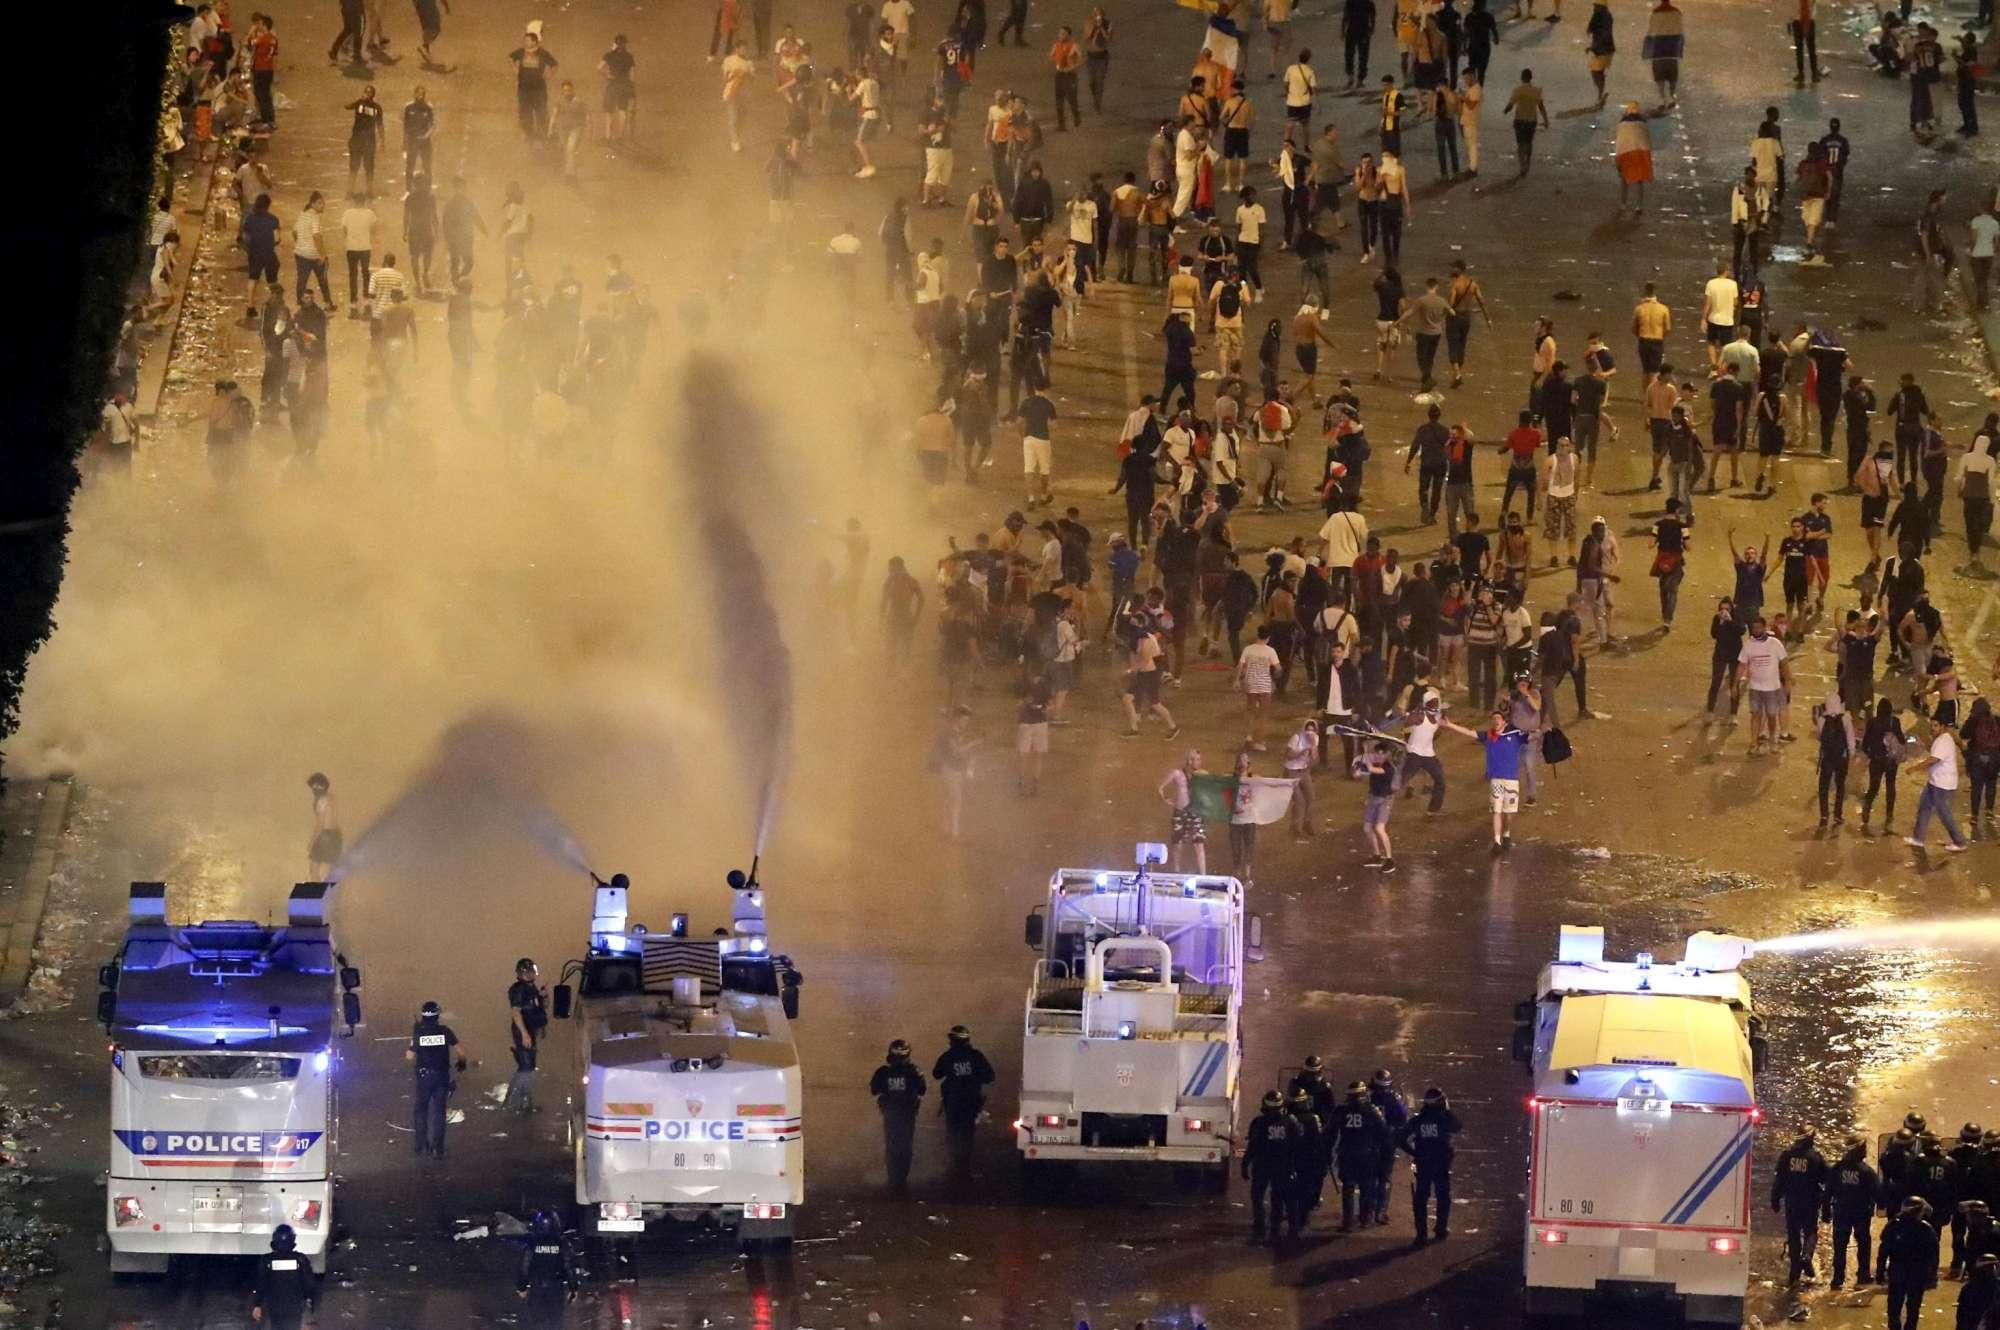 Mondiali, incidenti e saccheggi a Parigi: evacuati gli Champs Elysées